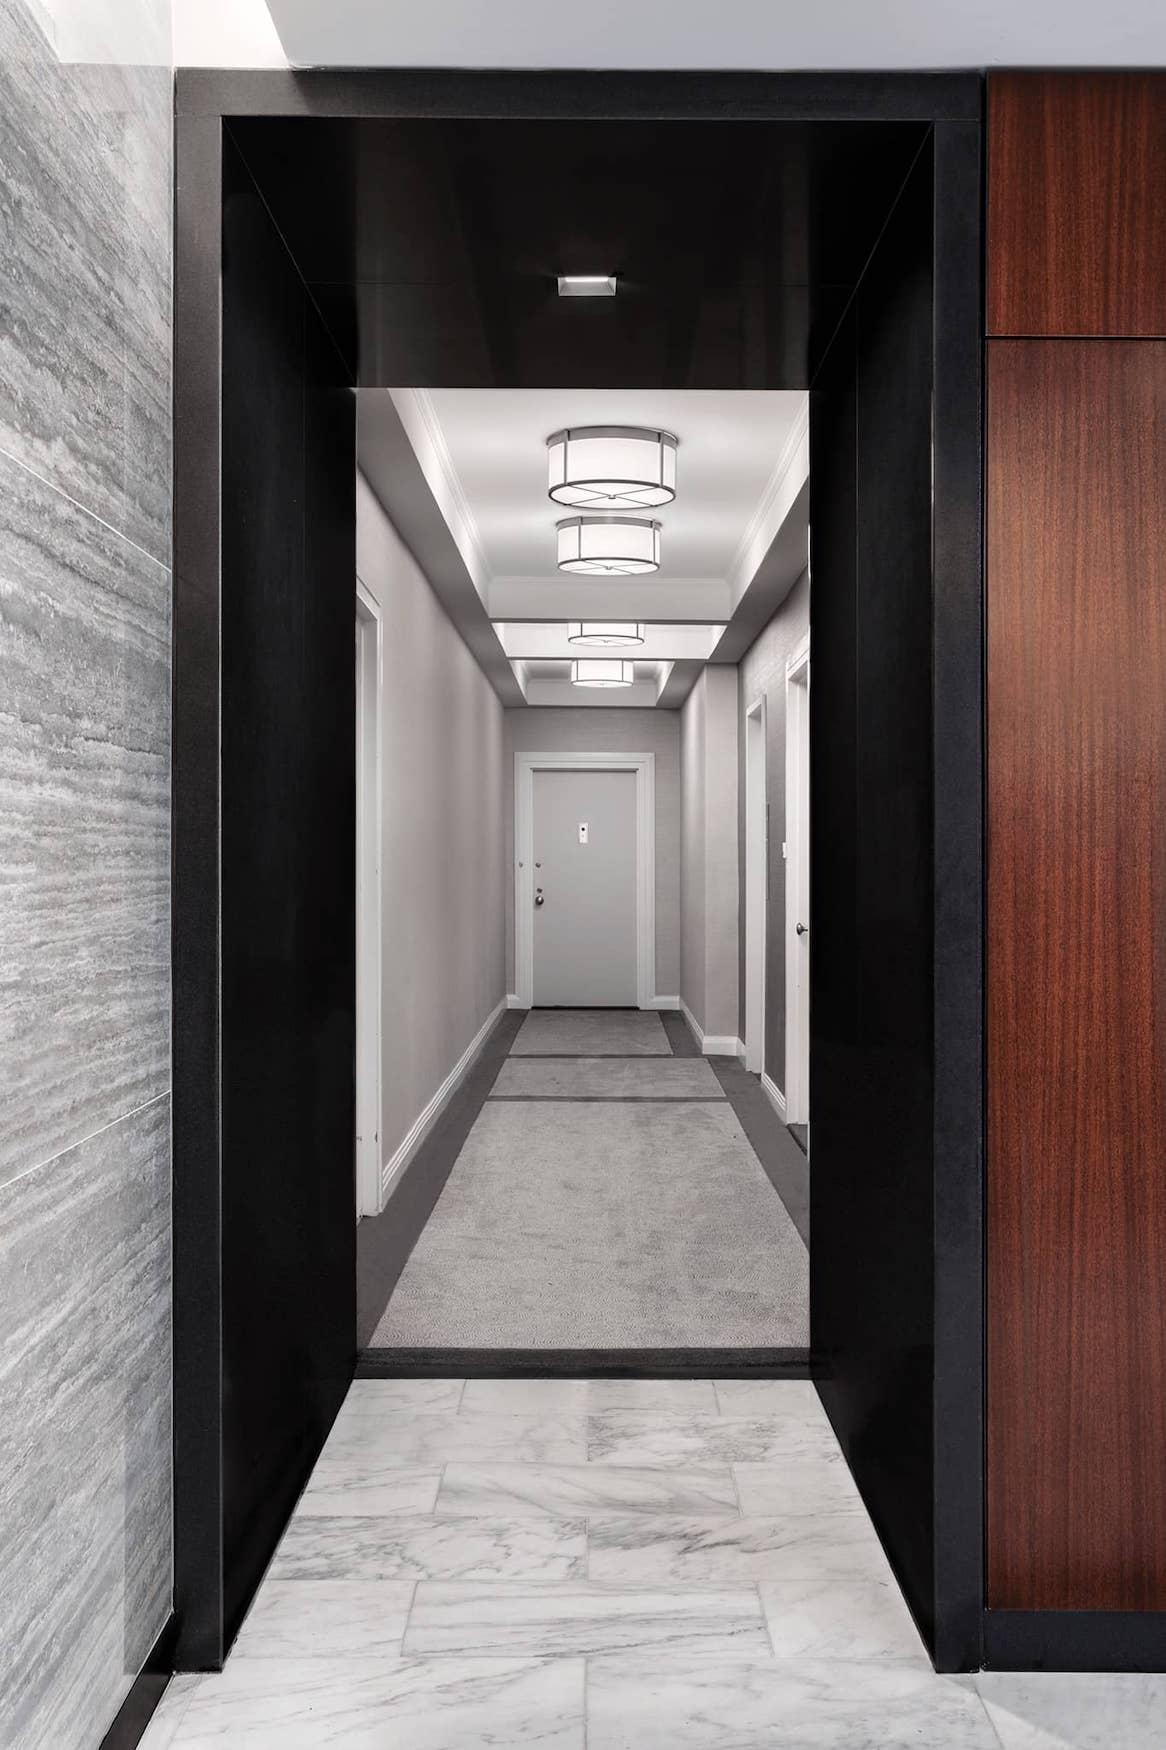 Hallway at 8 East 83rd Street